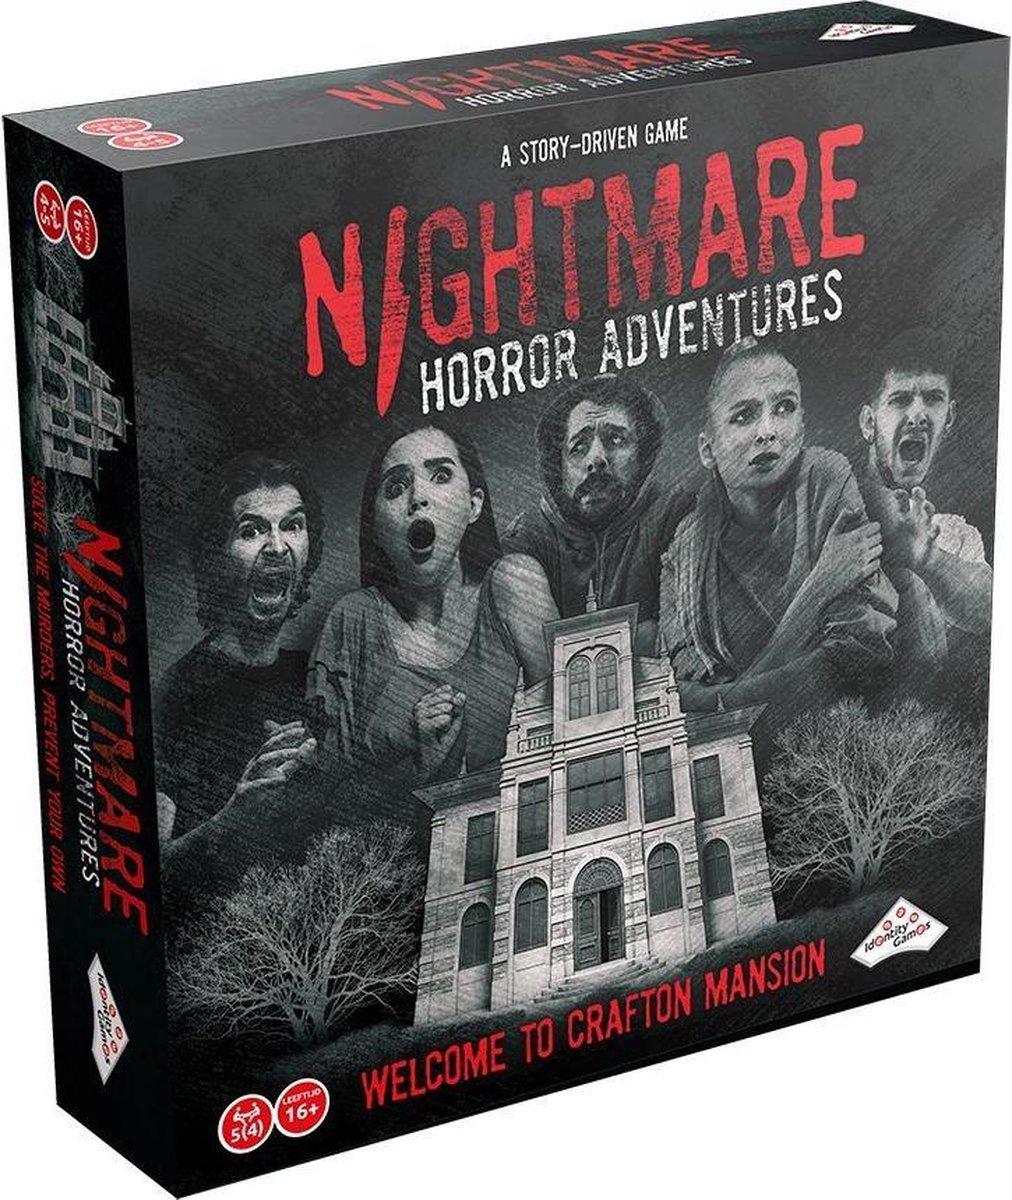 Idg-13766,Nightmare horro adventures spel